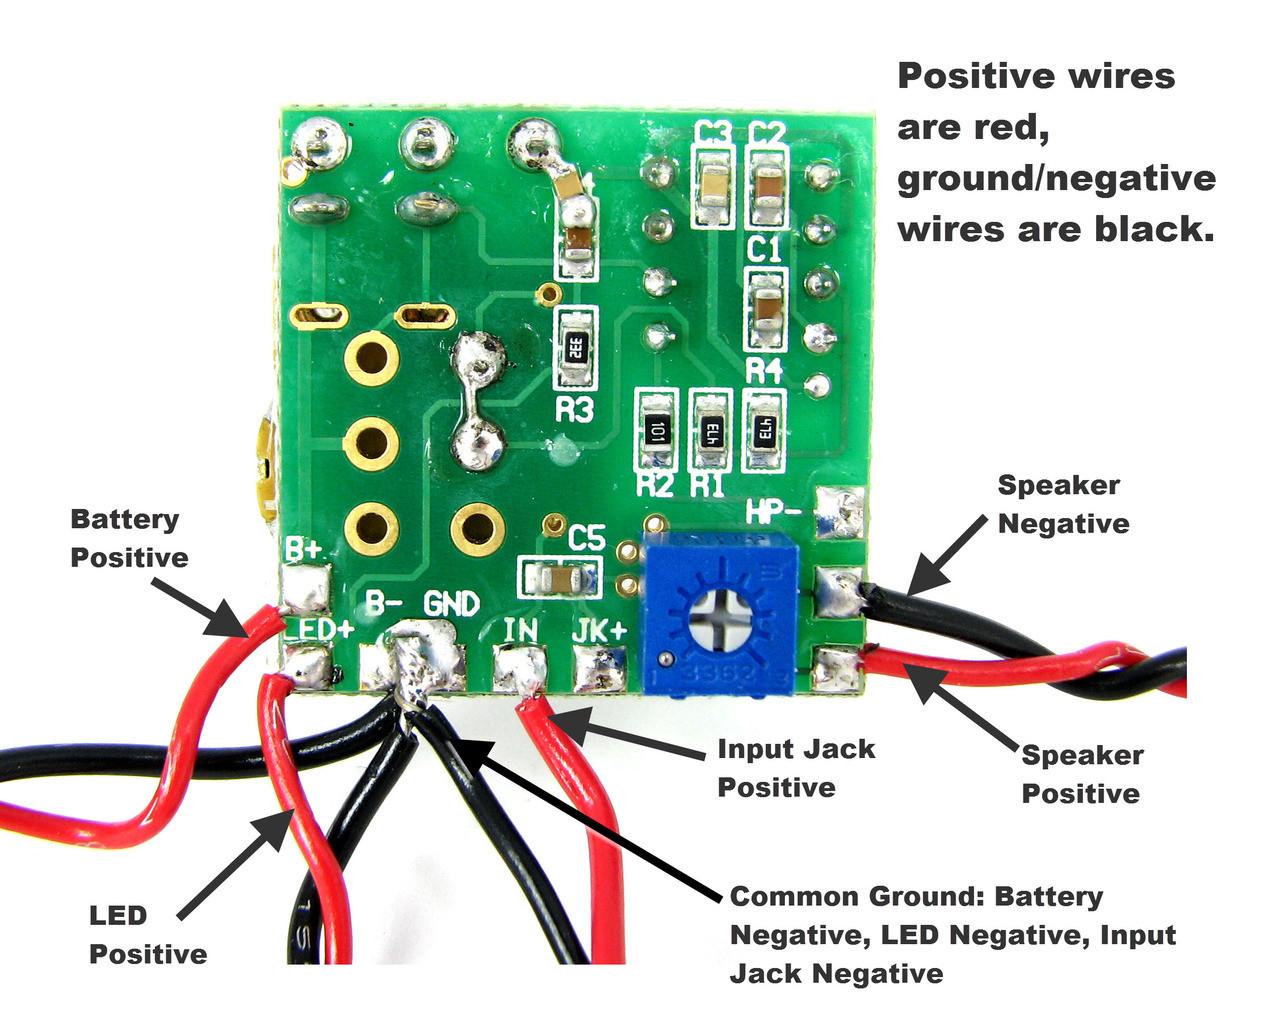 1 4 jack wiring to circuit board wiring diagrams wd 1 4 plug wiring 1 4 inch audio jack wiring [ 1280 x 1027 Pixel ]